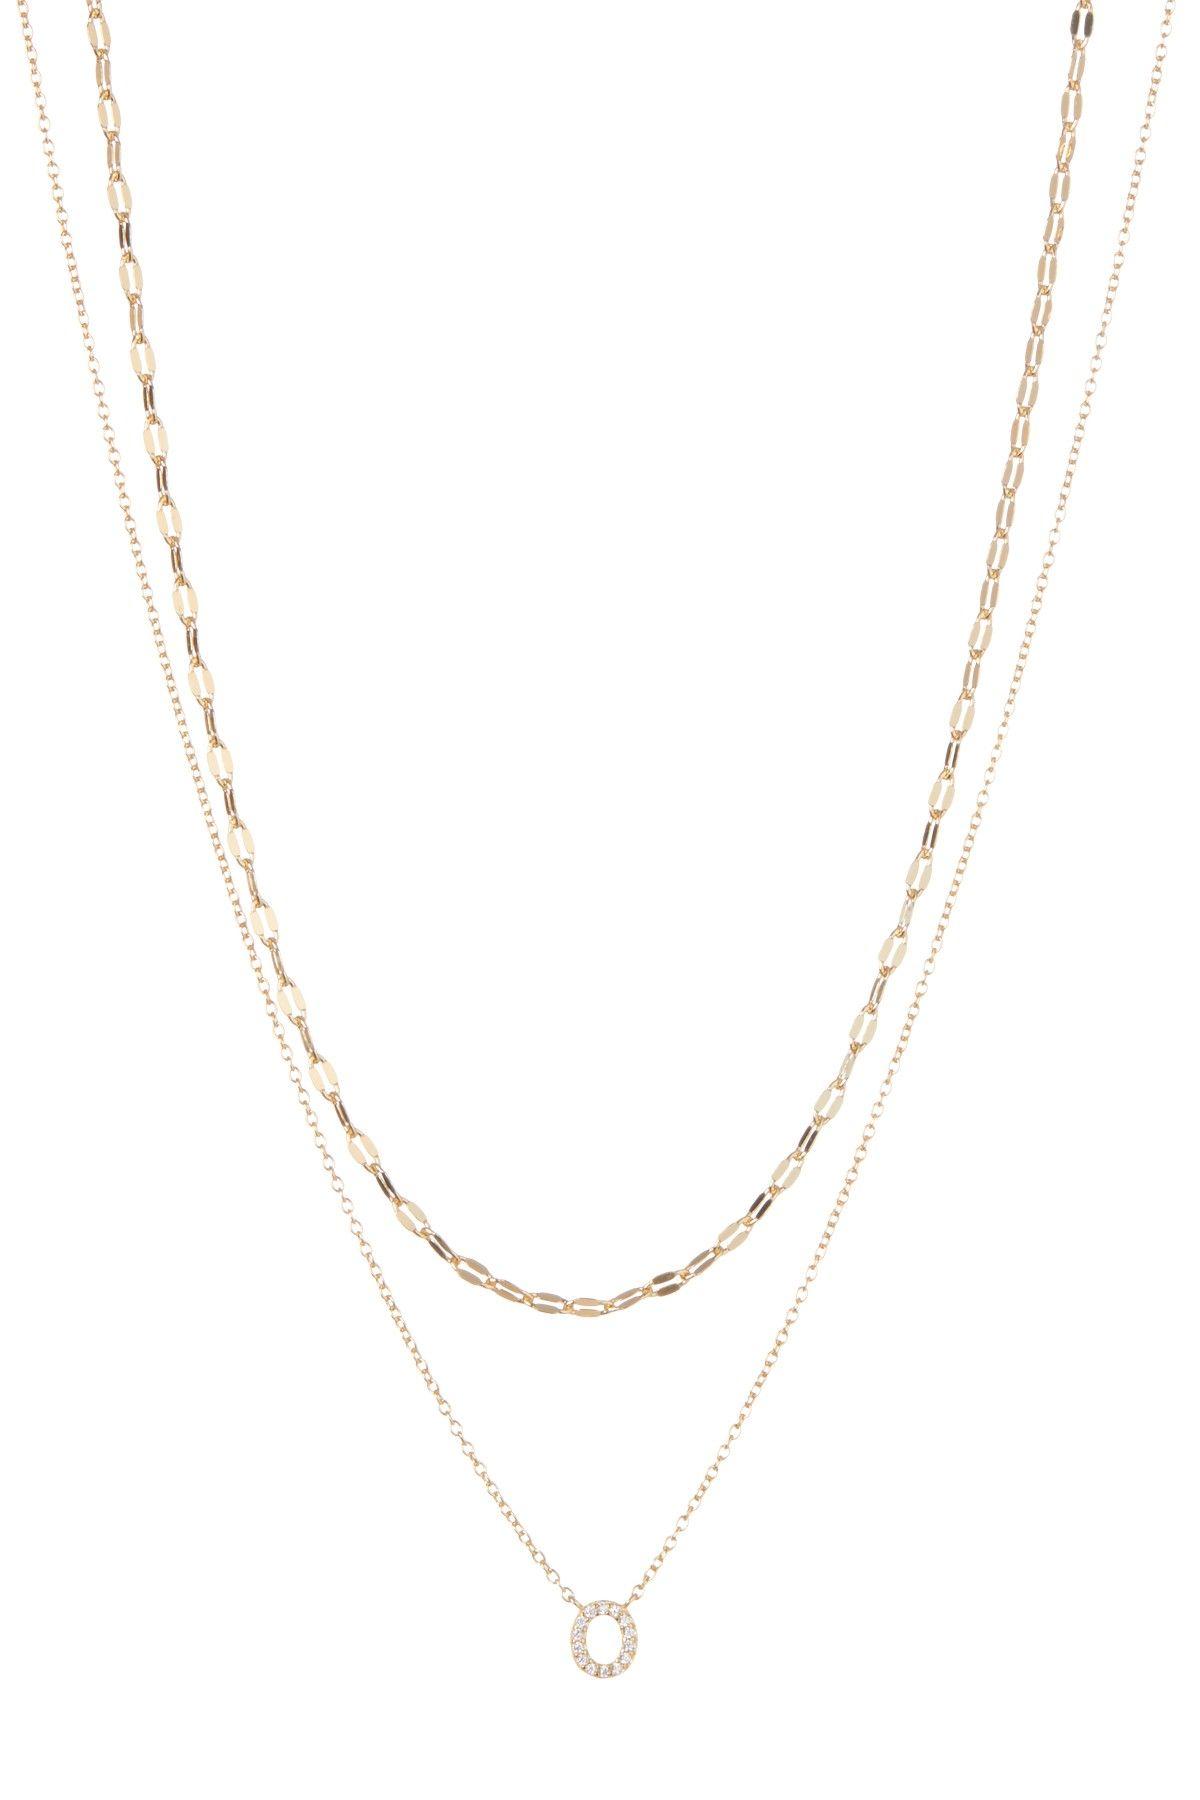 Double layer cz initial pendant necklace initial pendant double layer cz initial pendant necklace mozeypictures Images